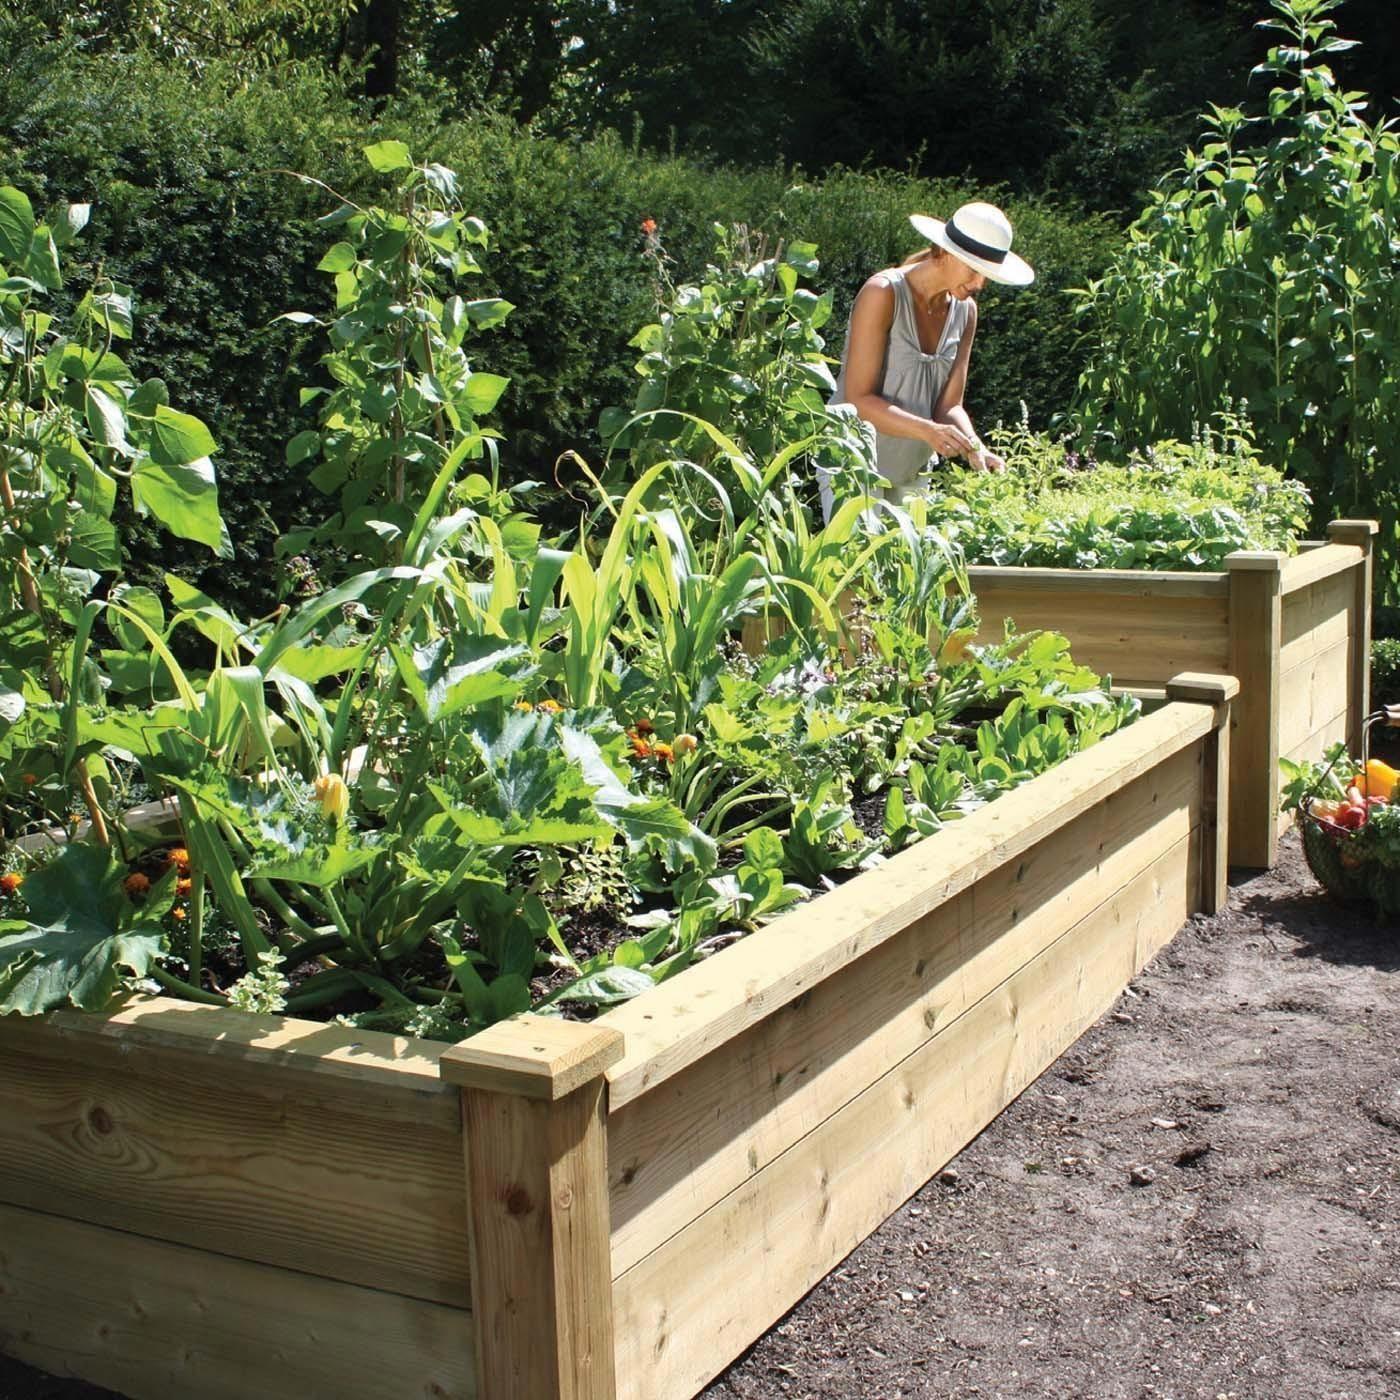 Superior Wooden Raised Bed Kits Harrod Horticultural Uk